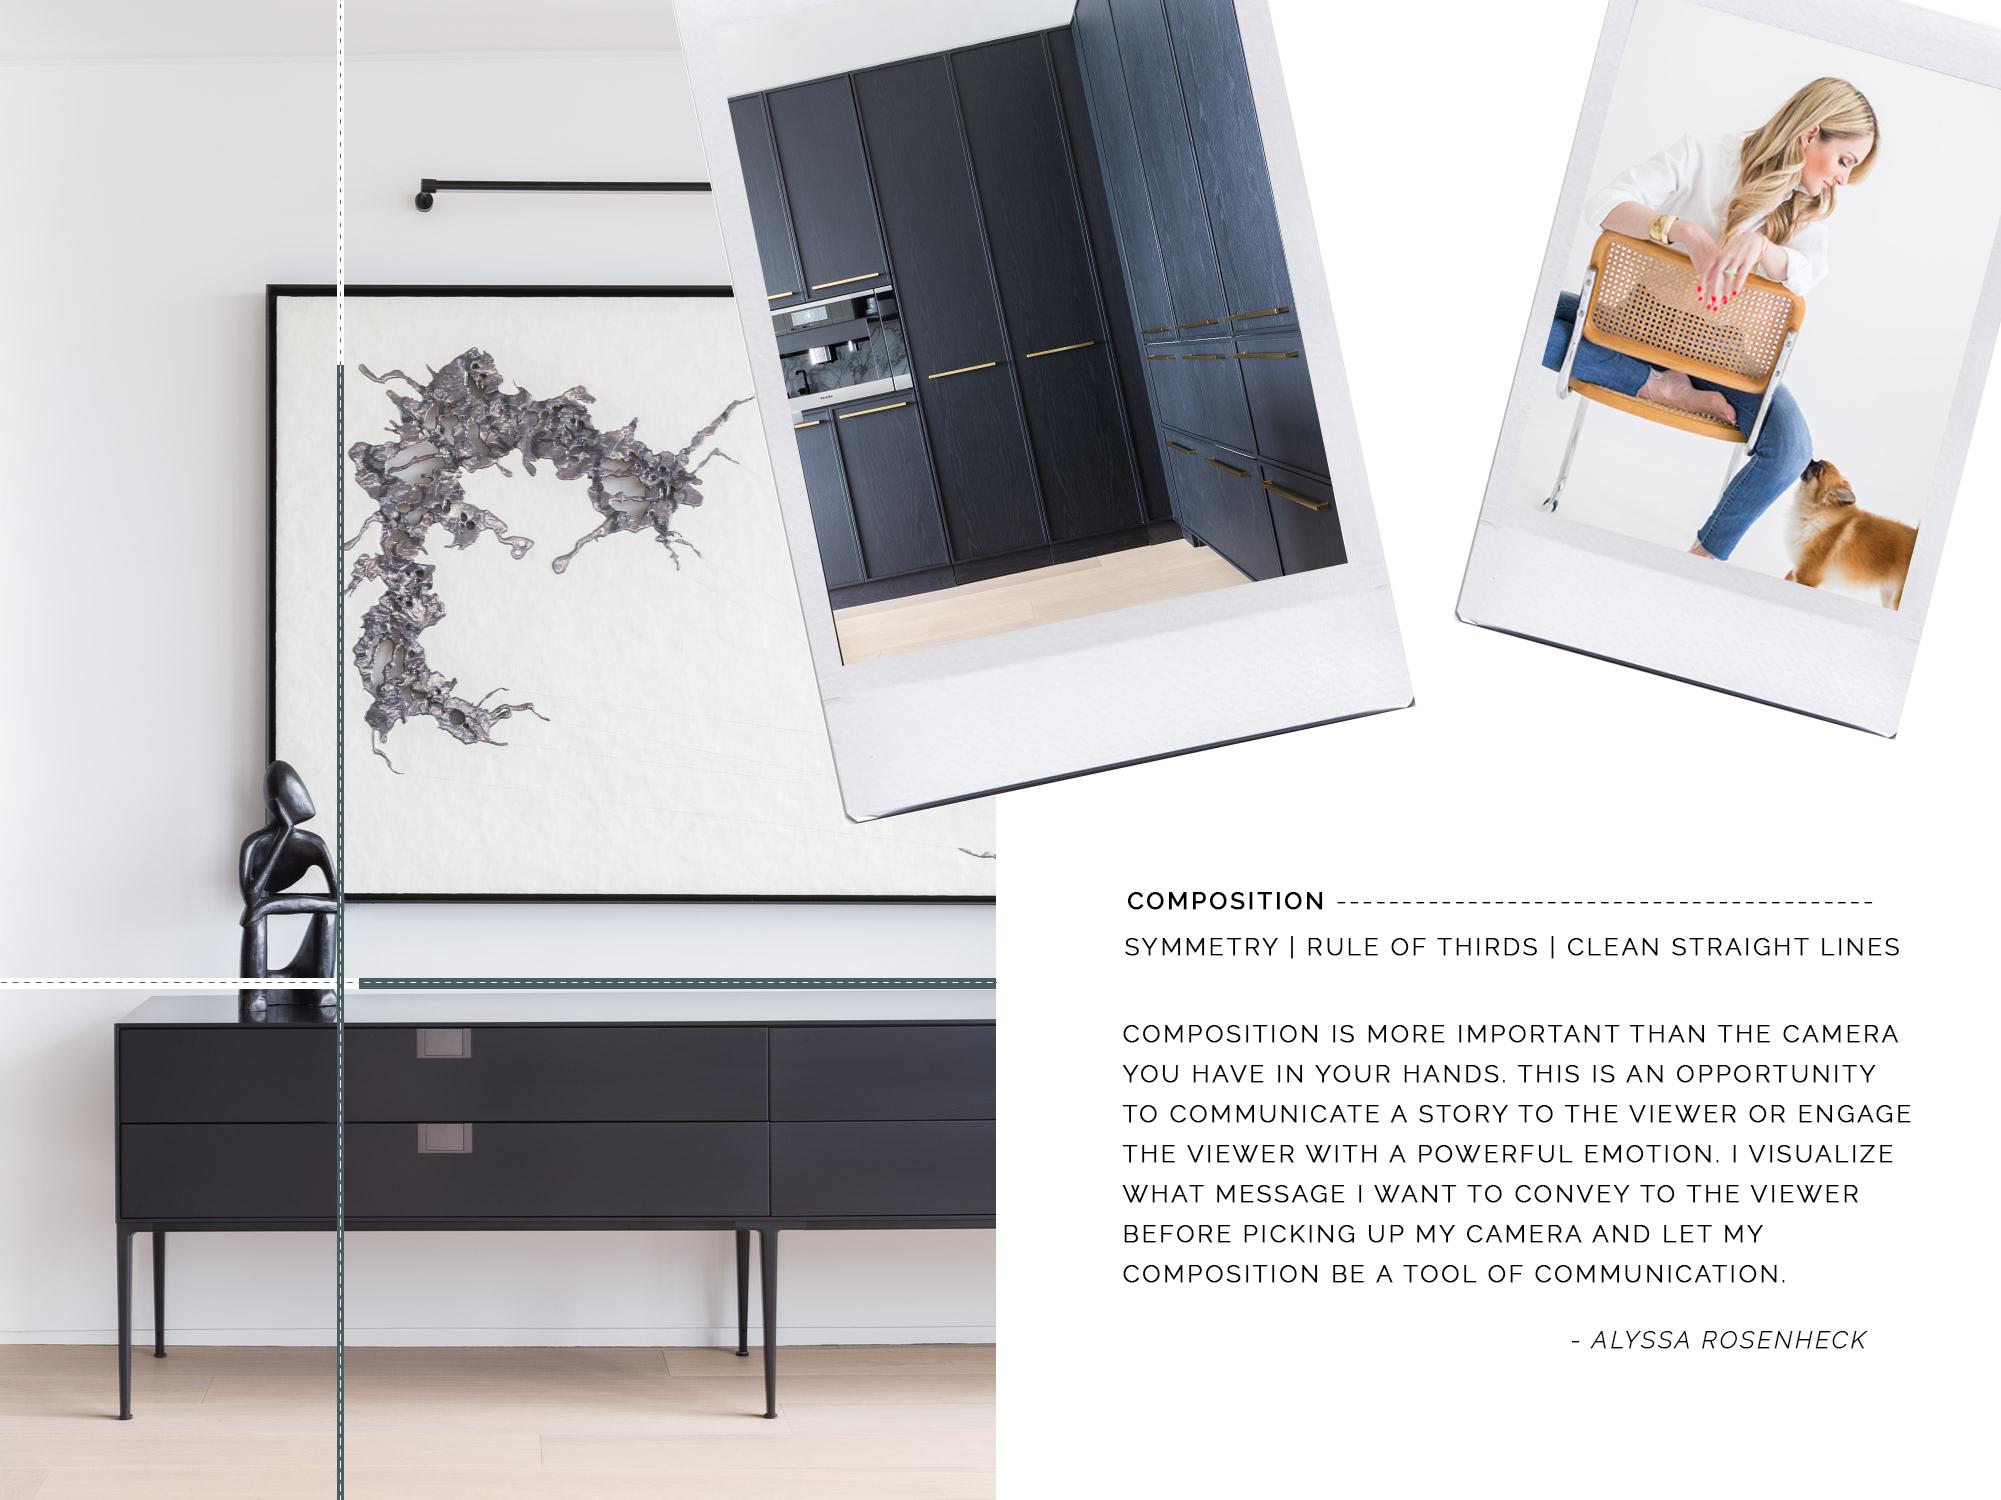 ©Alyssa Rosenheck for Architectural Digest - Design: Alexis Bednyak + Searl Lamaster Howe